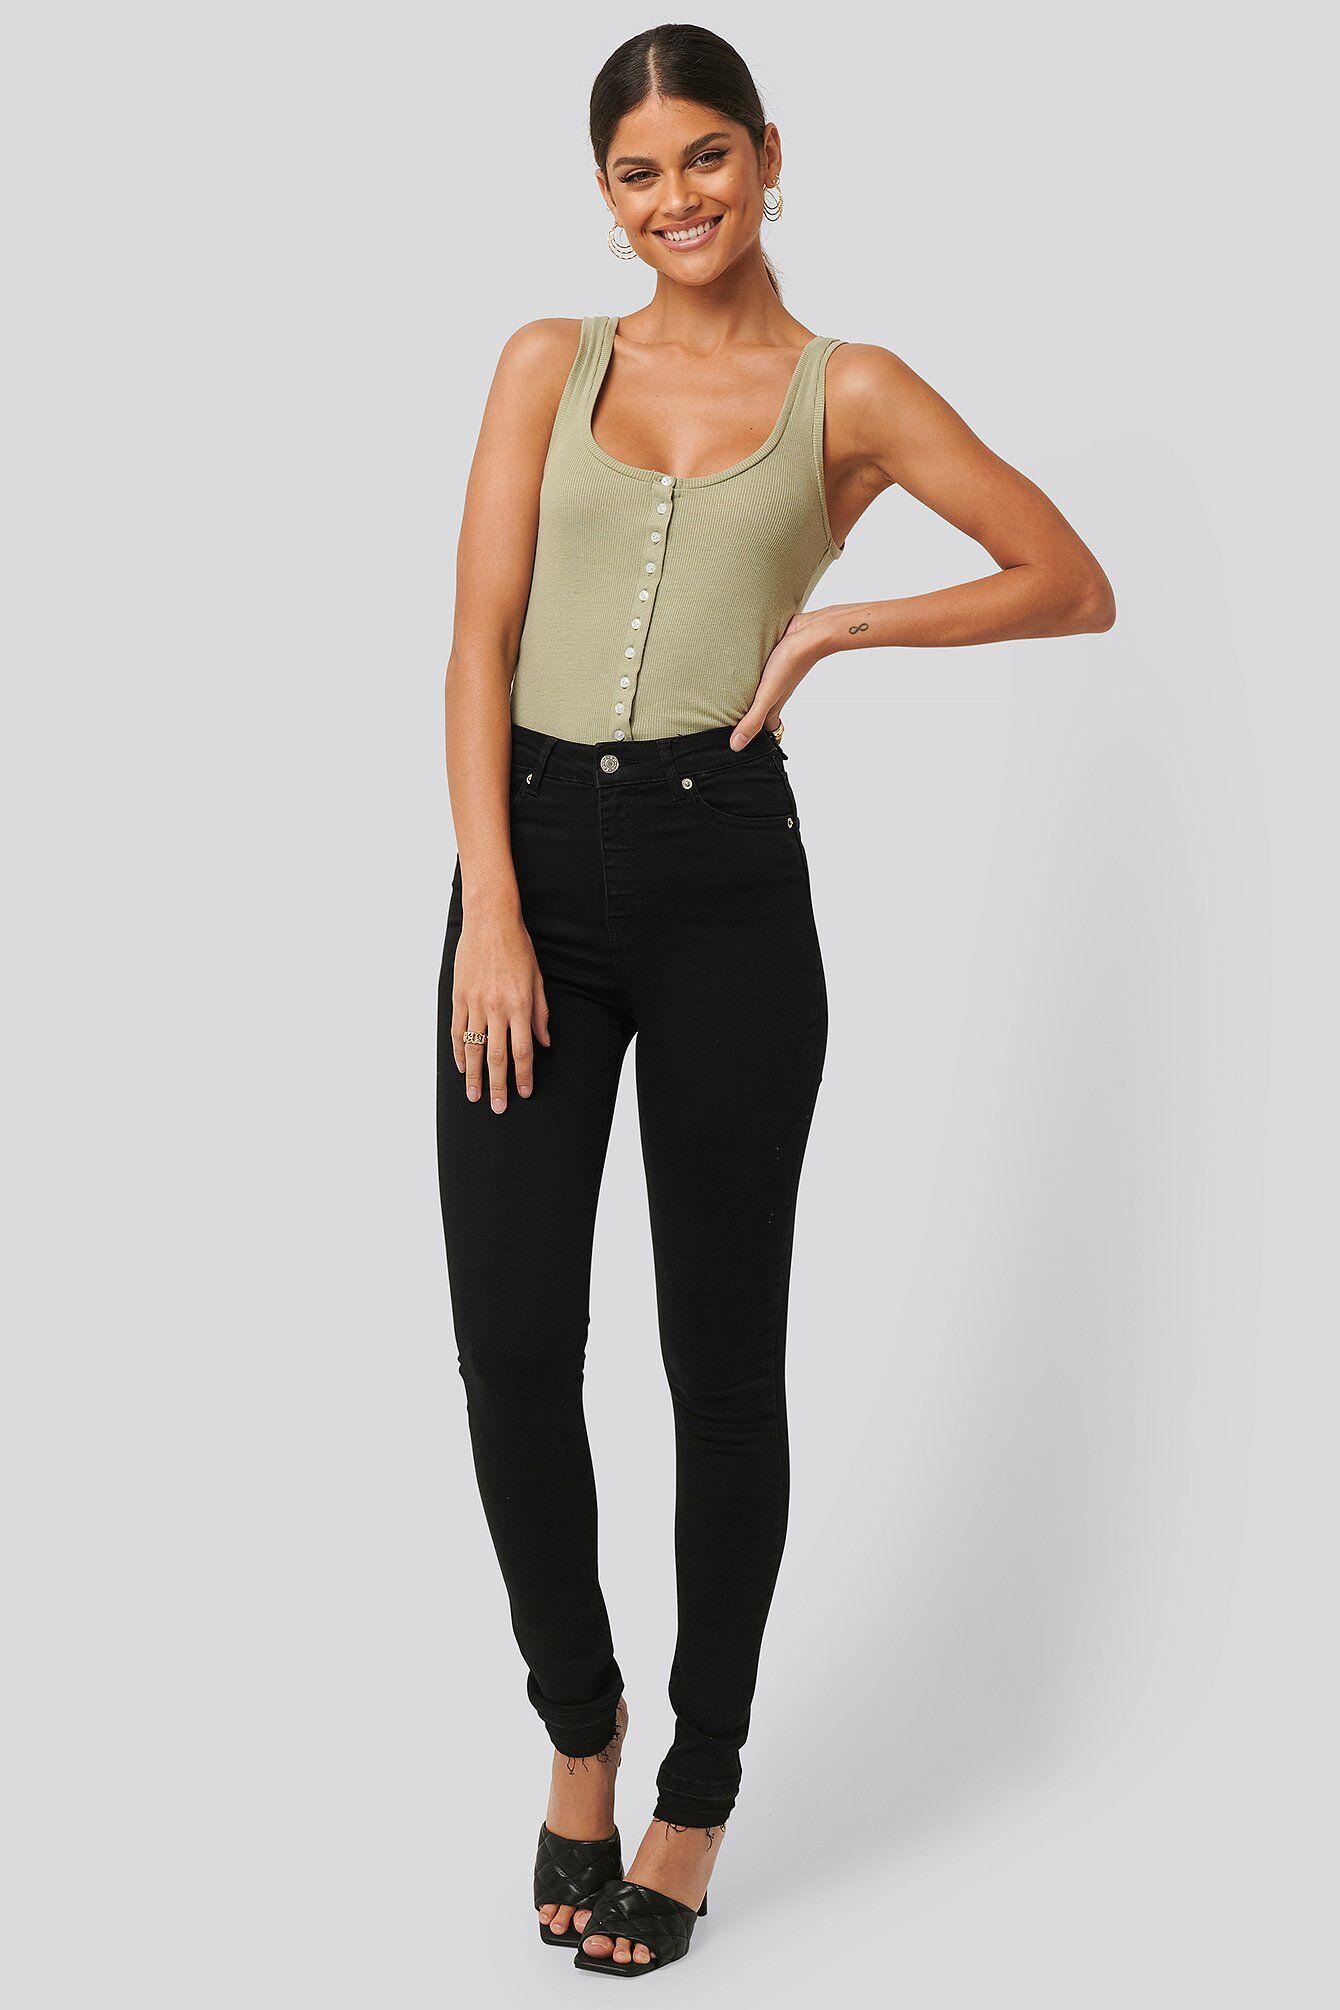 NA-KD Skinny High Waist Open Hem Jeans Tall - Black  - Size: EU 32,EU 34,EU 36,EU 38,EU 40,EU 42,EU 44